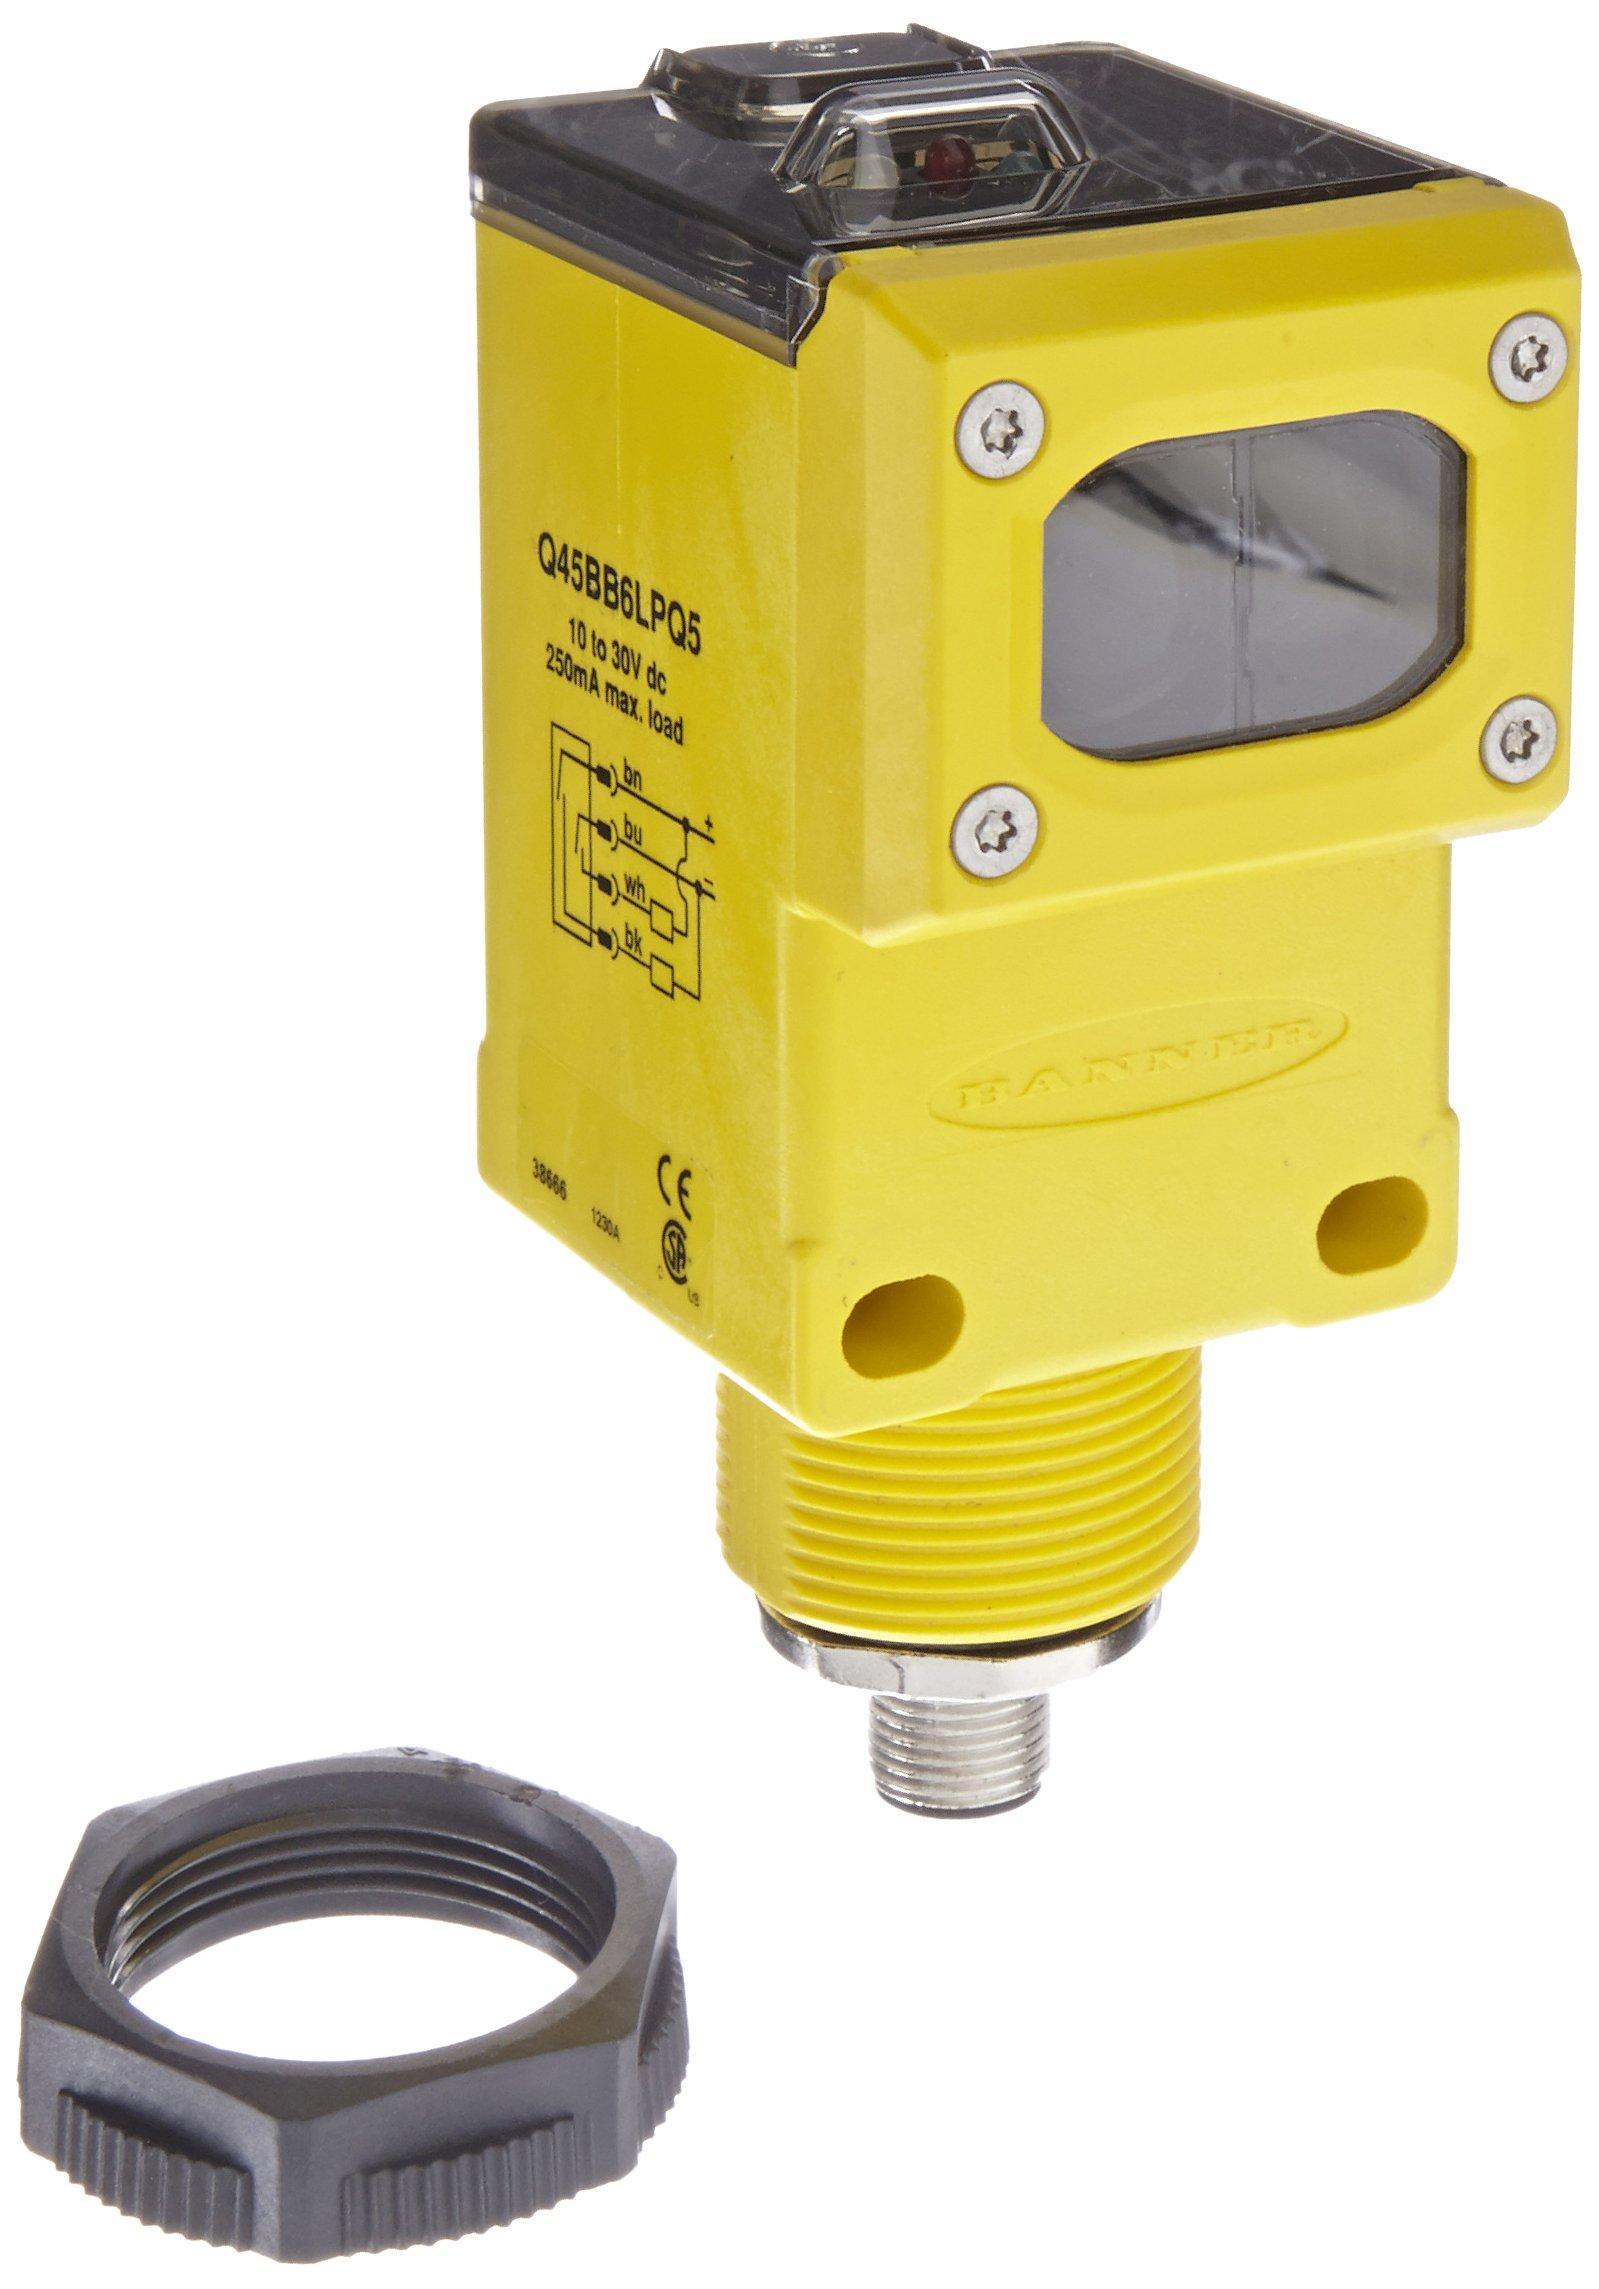 Banner Q45BB6LPQ5 Photoelectric Sensor, Polarized-Retroreflective Sensing Mode, 4-Pin Euro-Style QD Connector, M30 Threaded Mount, Visible Red LED, 10-30 VDC Supply Voltage, Bipolar (PNP and NPN) Output, 6 m Sensing Range